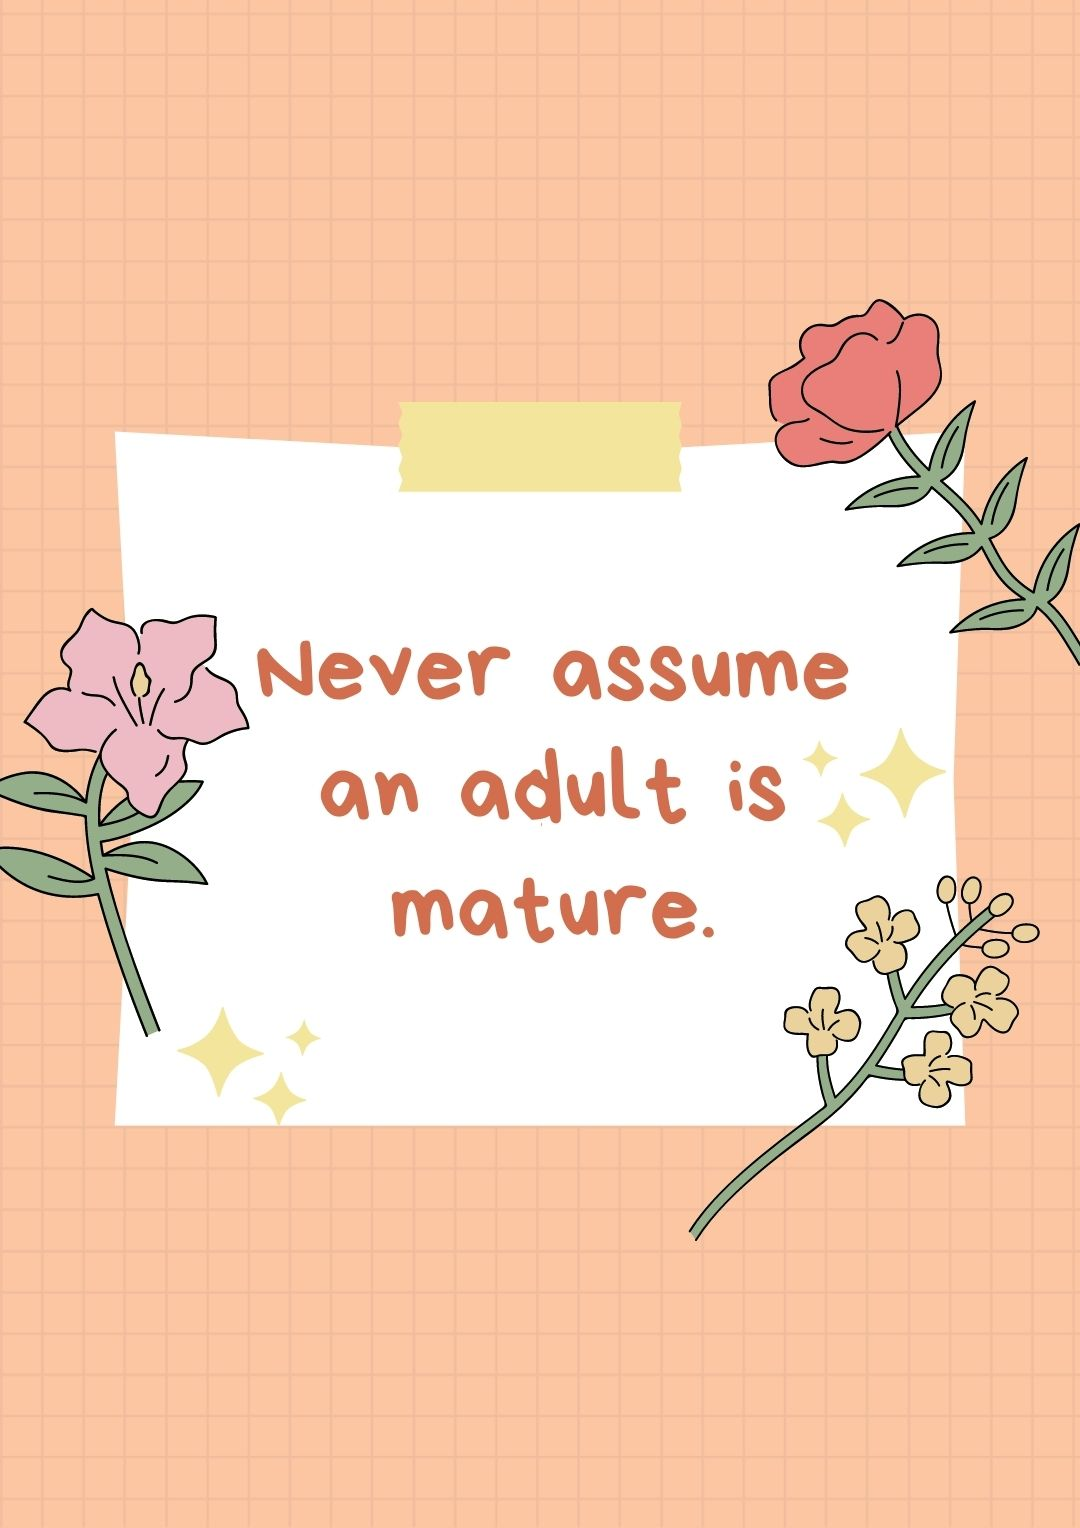 Never assume an adult is mature.